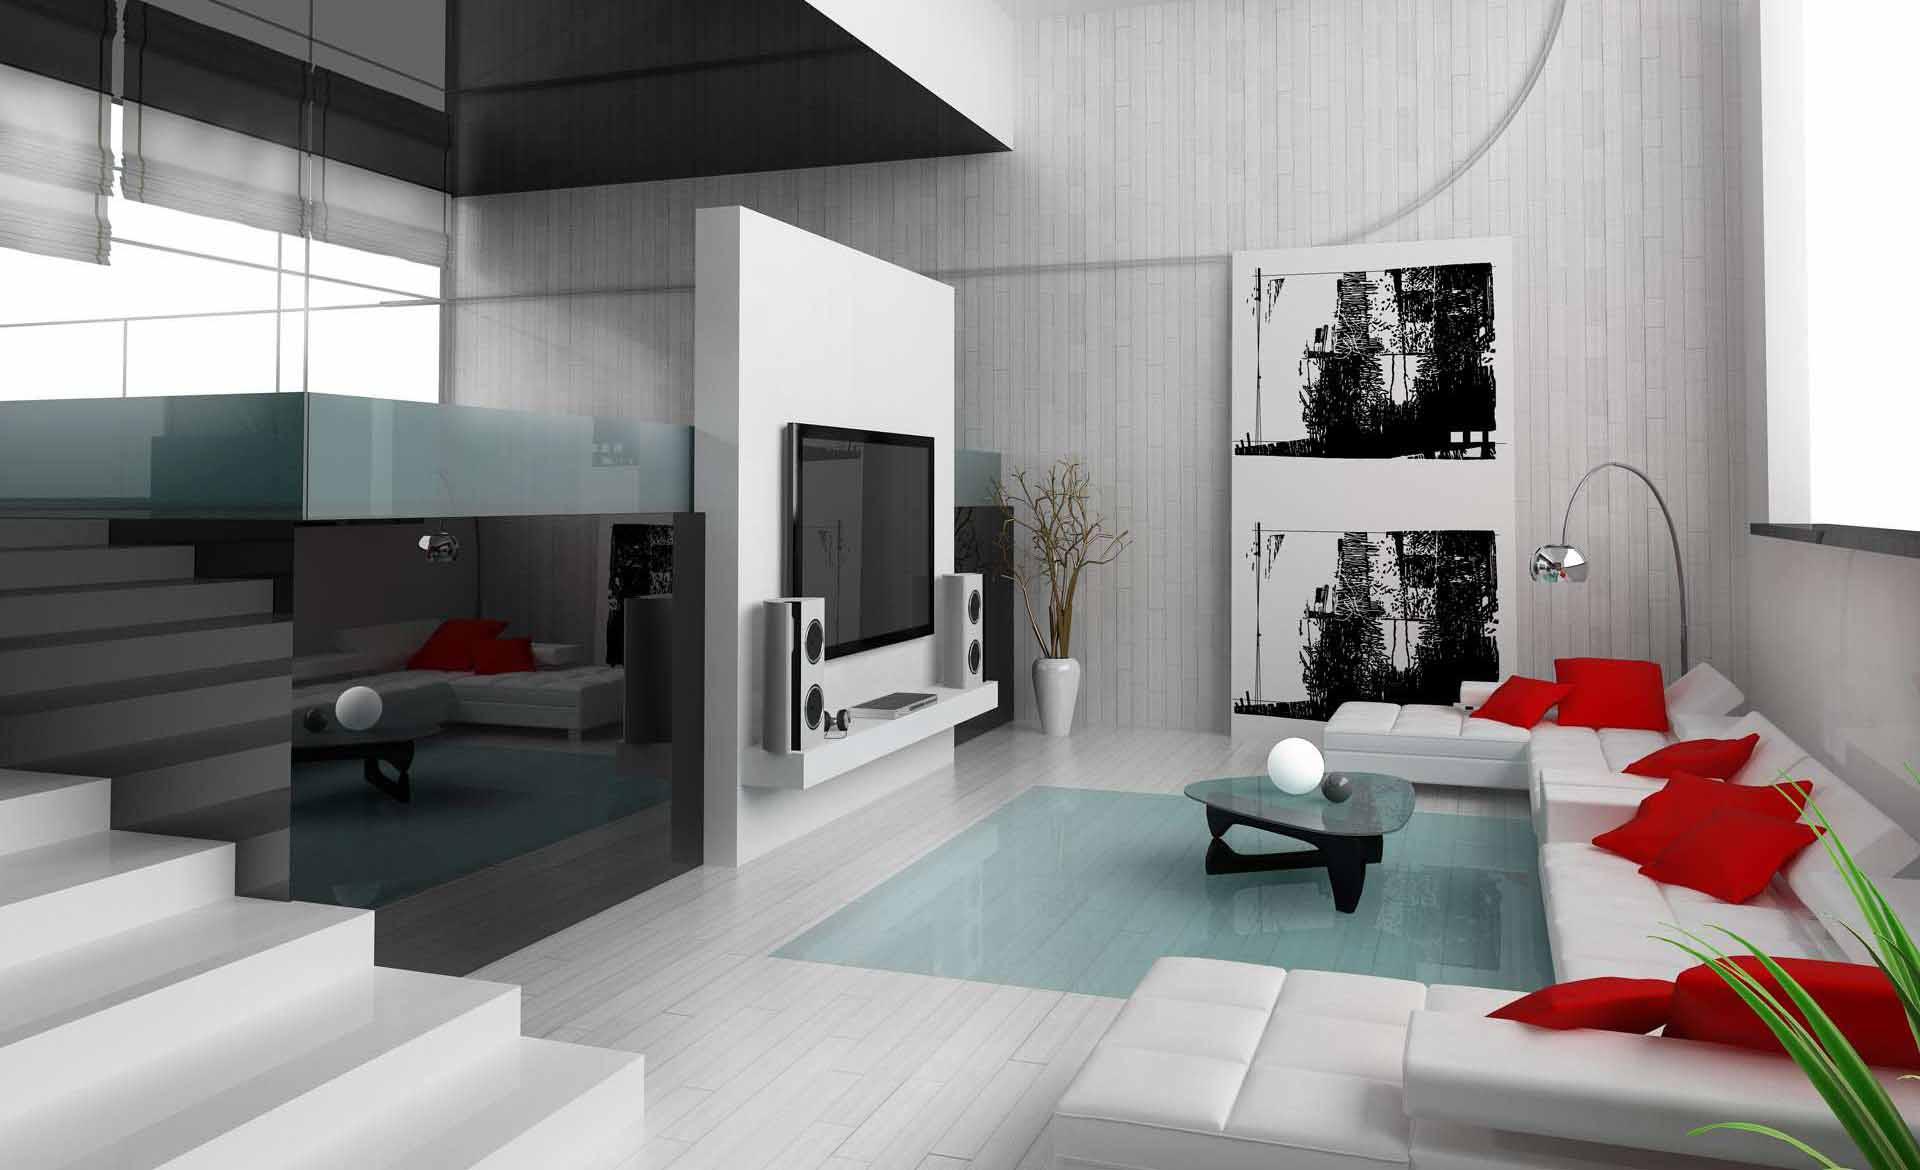 interior-design-ideas37-modern-living-room-home-interior-design-ideas-Desain-Ruang-Tamu-Rumah-Ultra-Modern-Minimalis